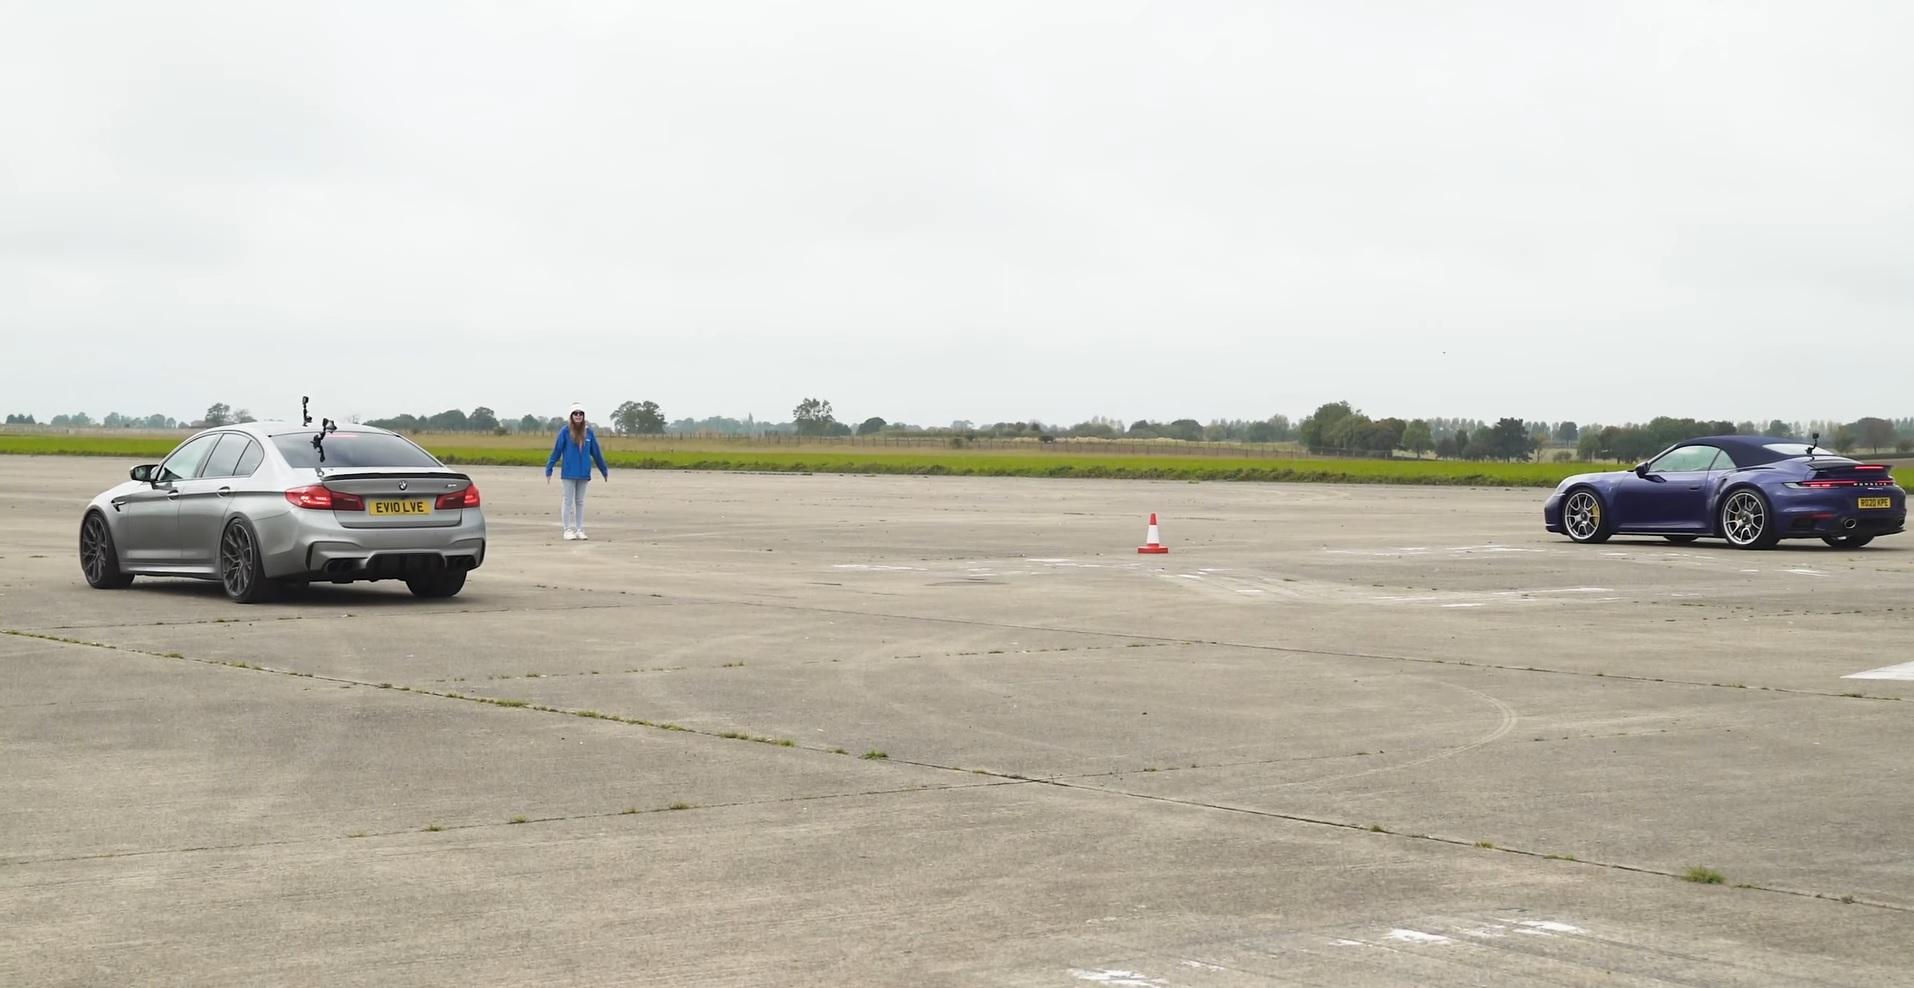 BMW M5 vs Porsche 911 Turbo S - Drag race